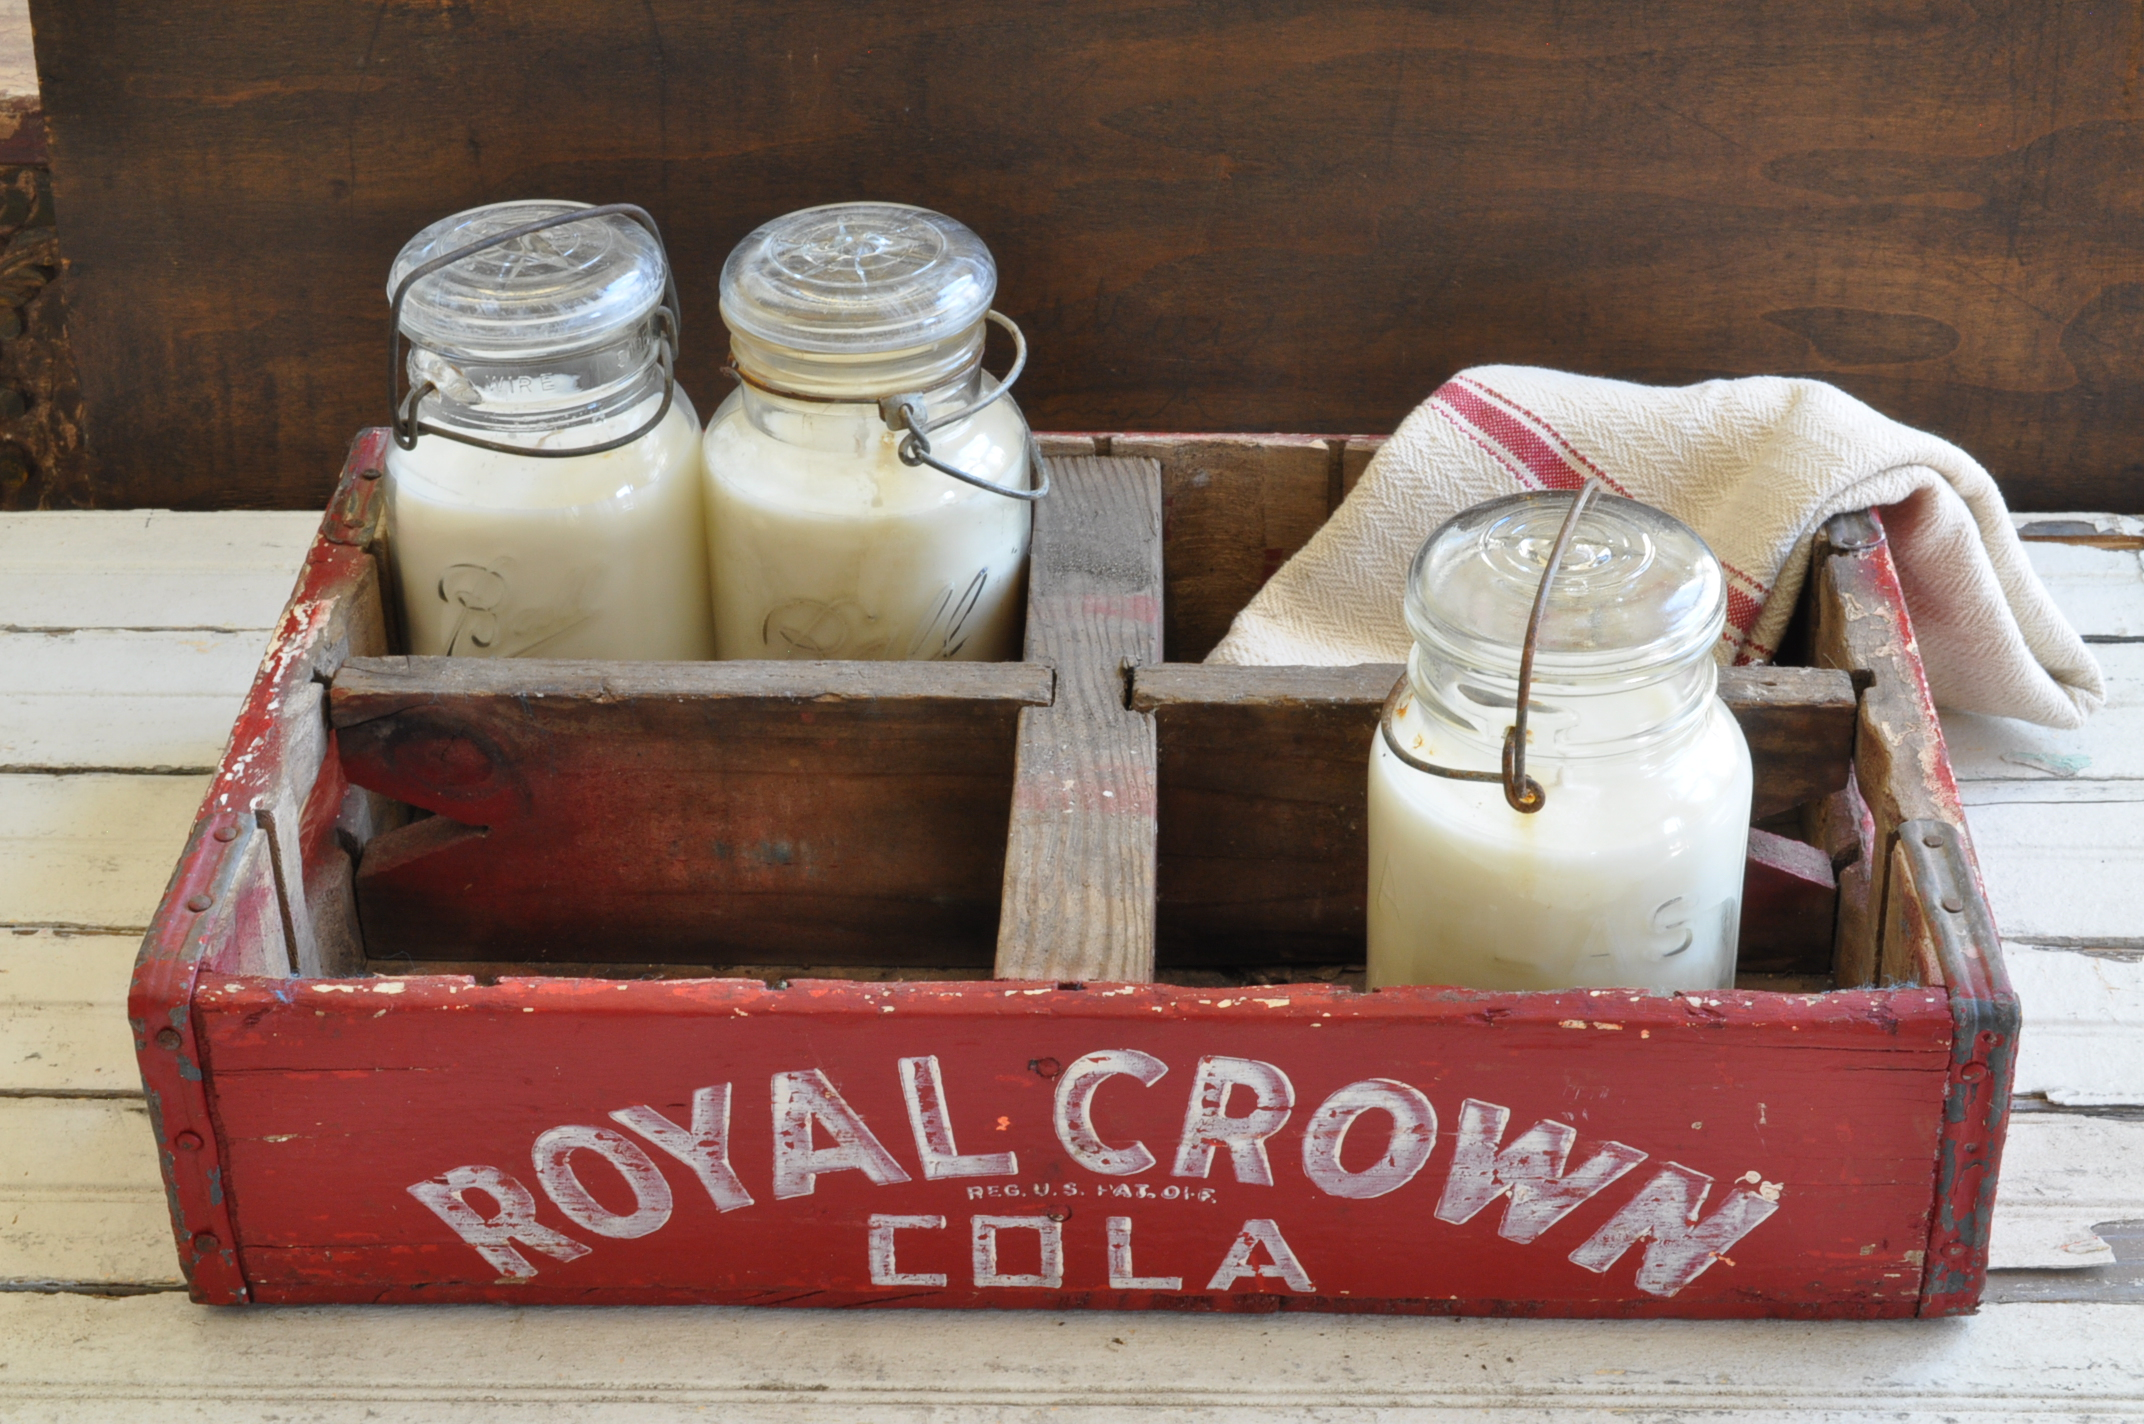 Vintage Royal Crown Cola Crate - The Vintage Round Top Shop